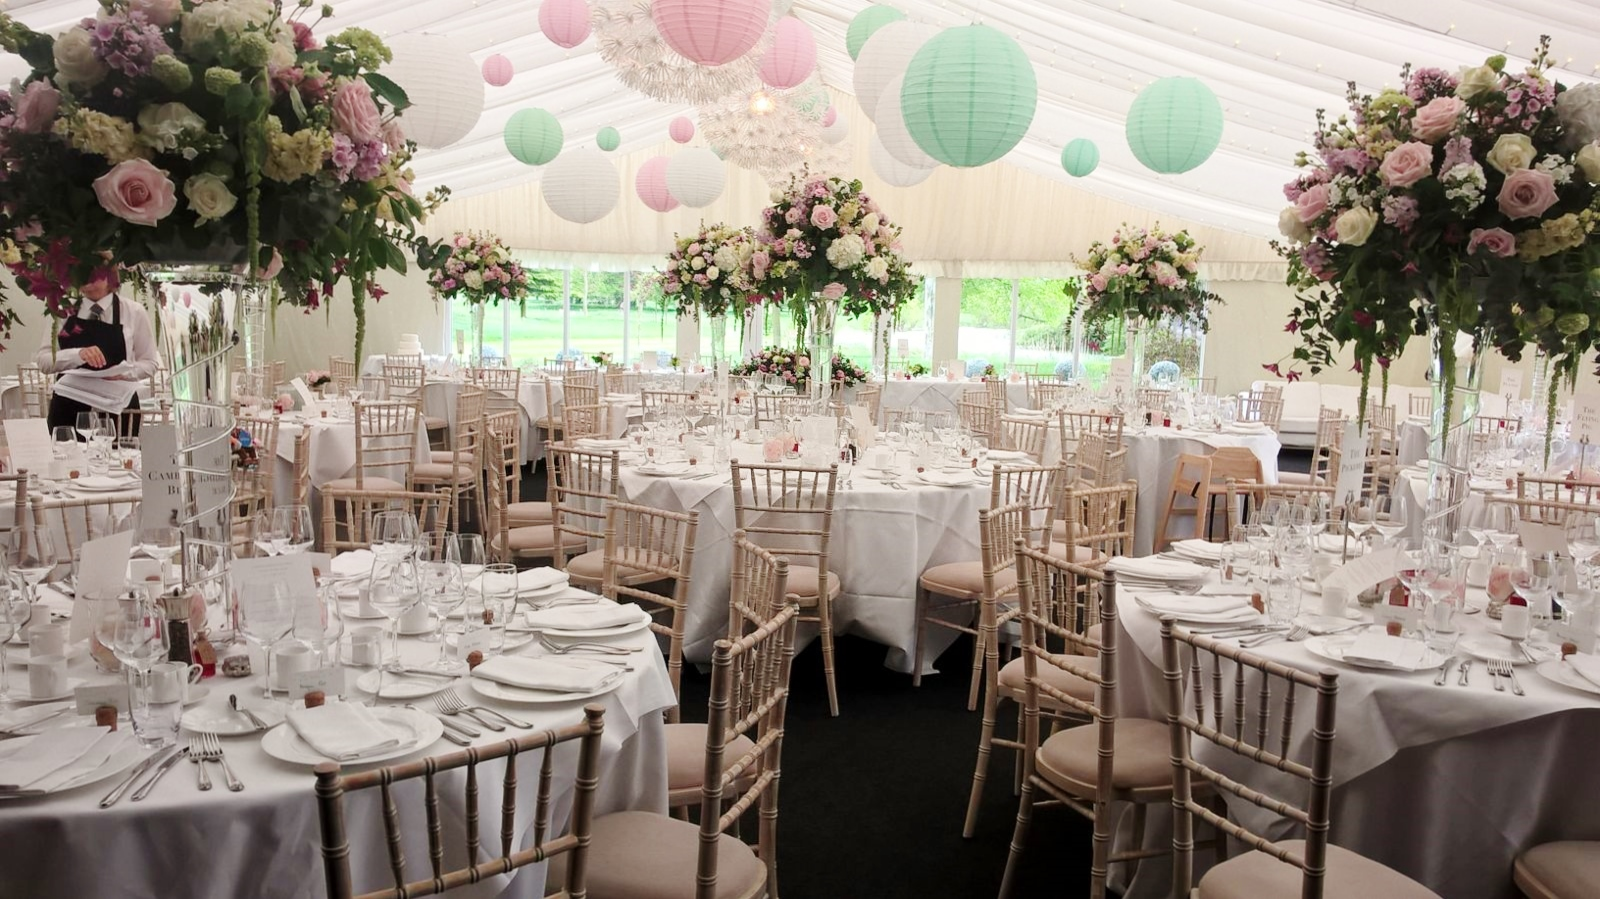 spring weddings at chippenham park crown catering cambridge